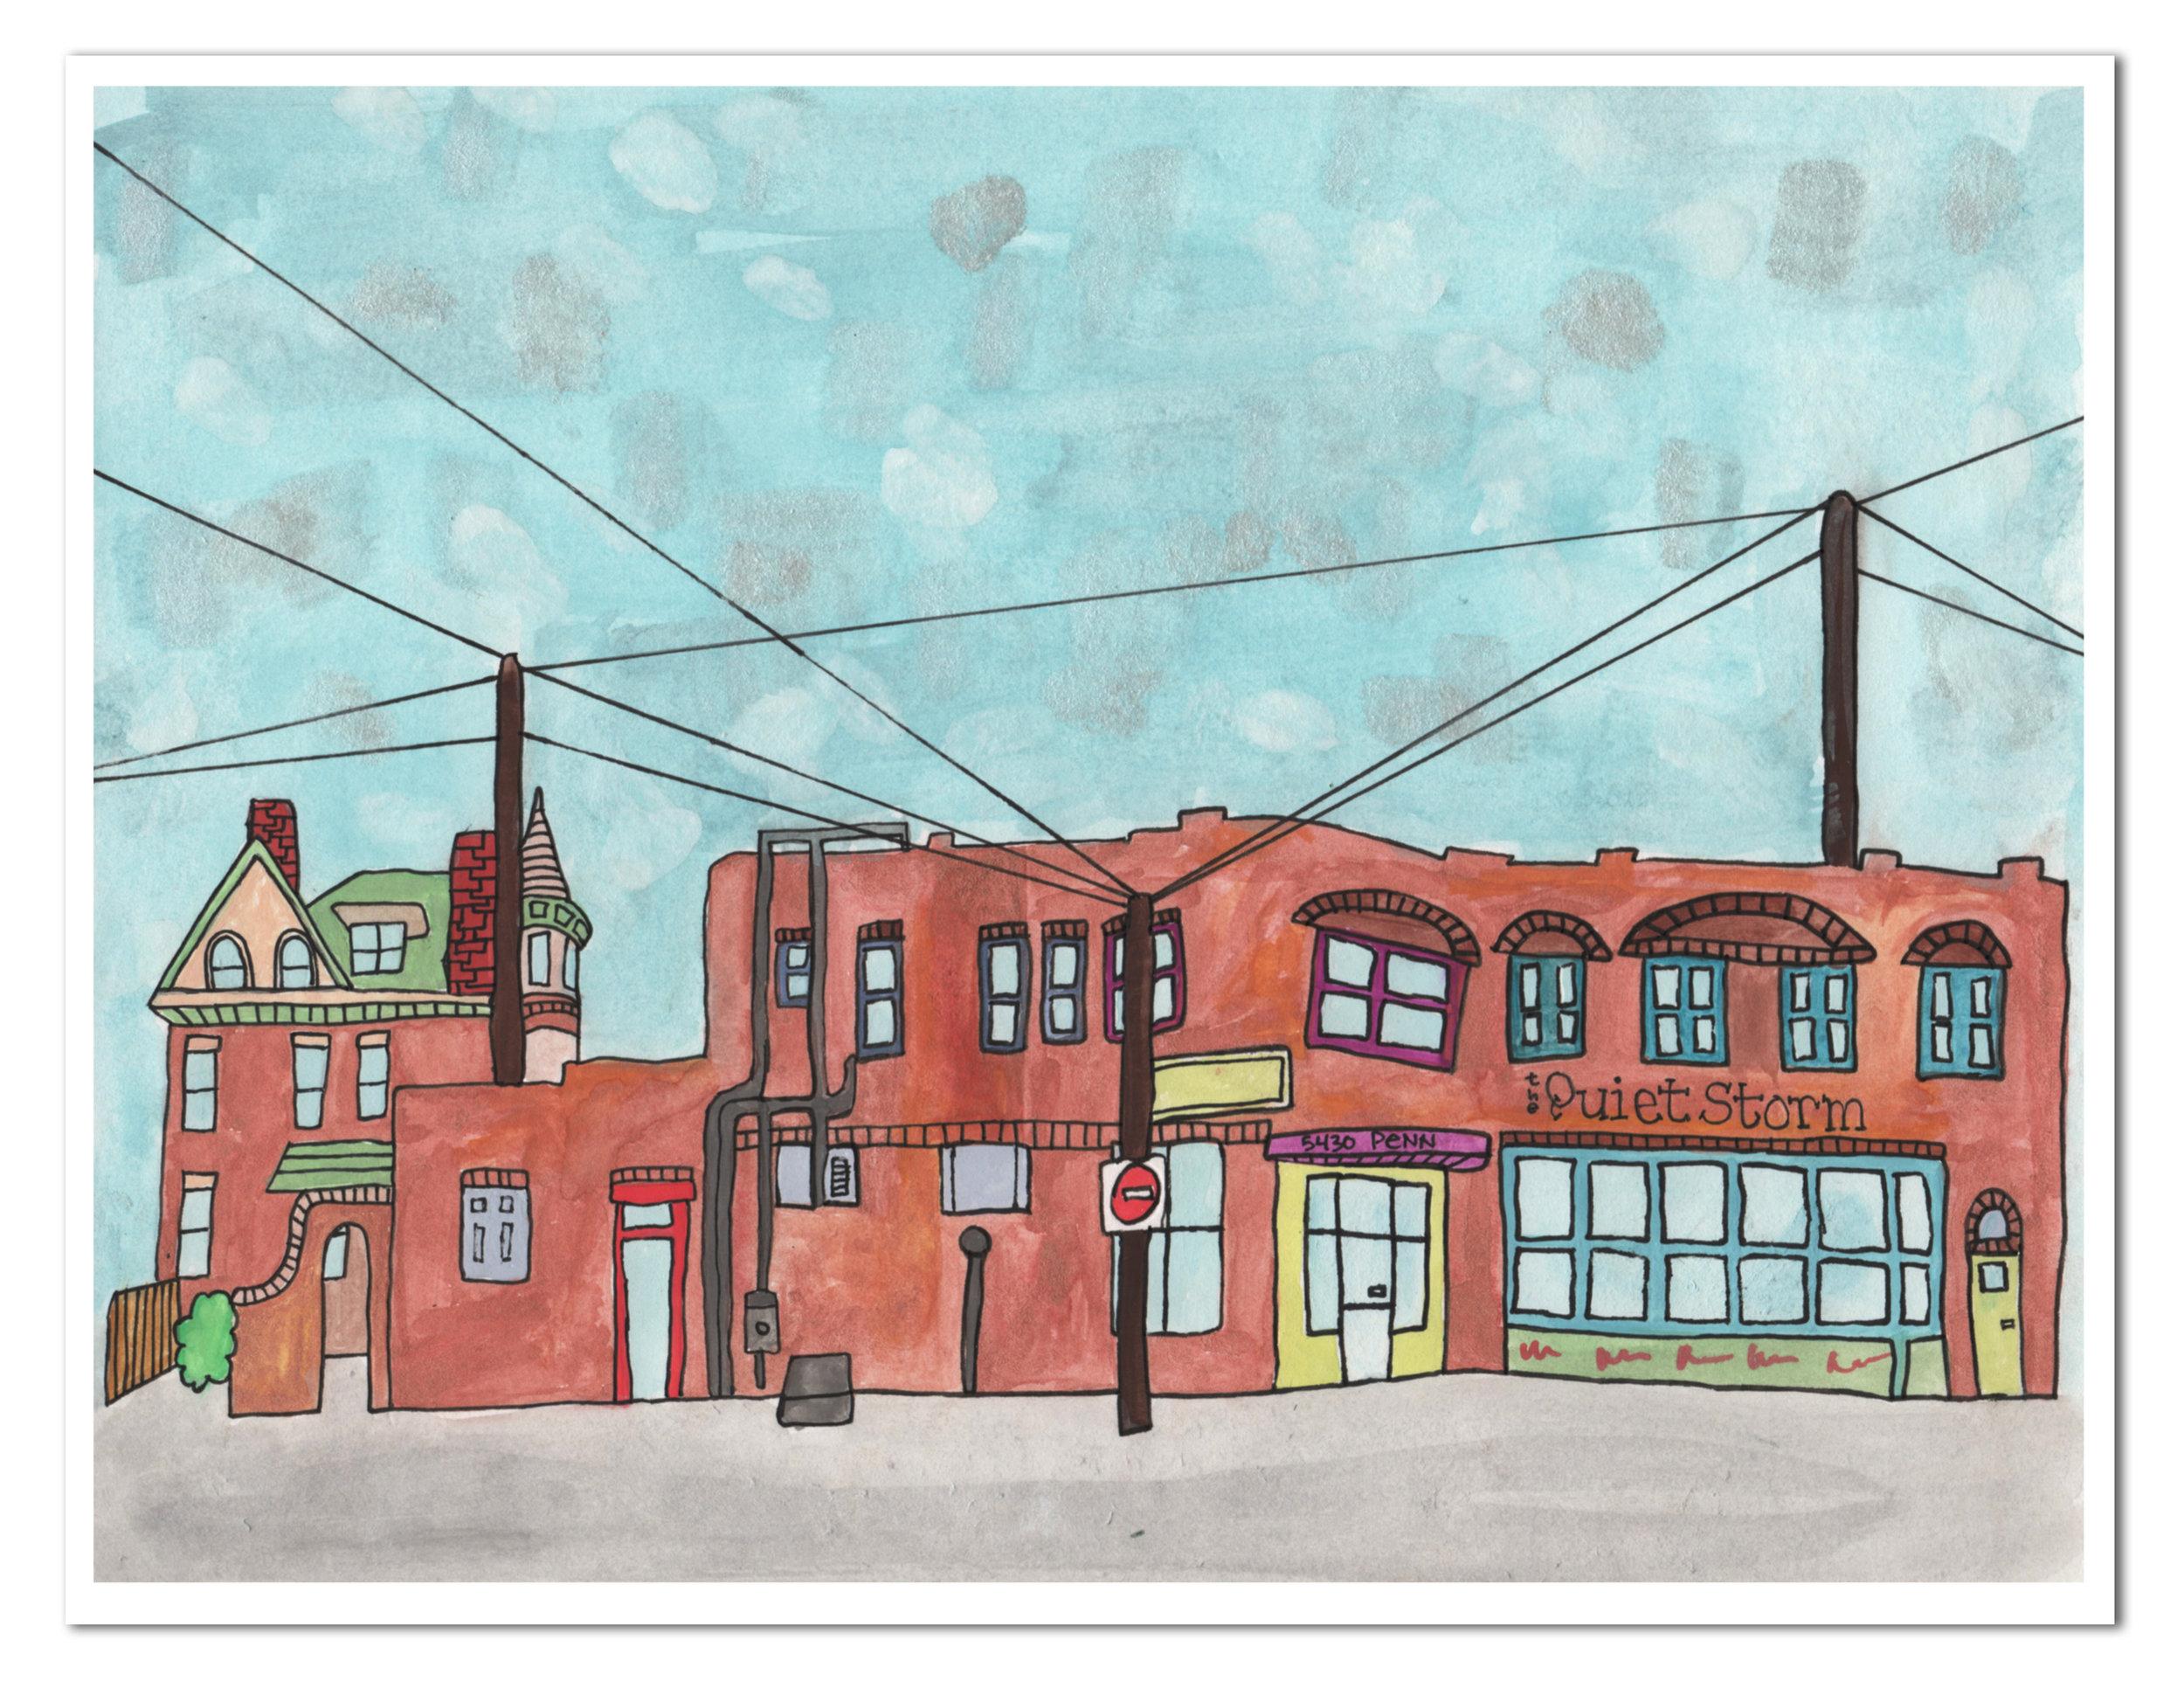 cusrtom watercolor house portrait city.jpg